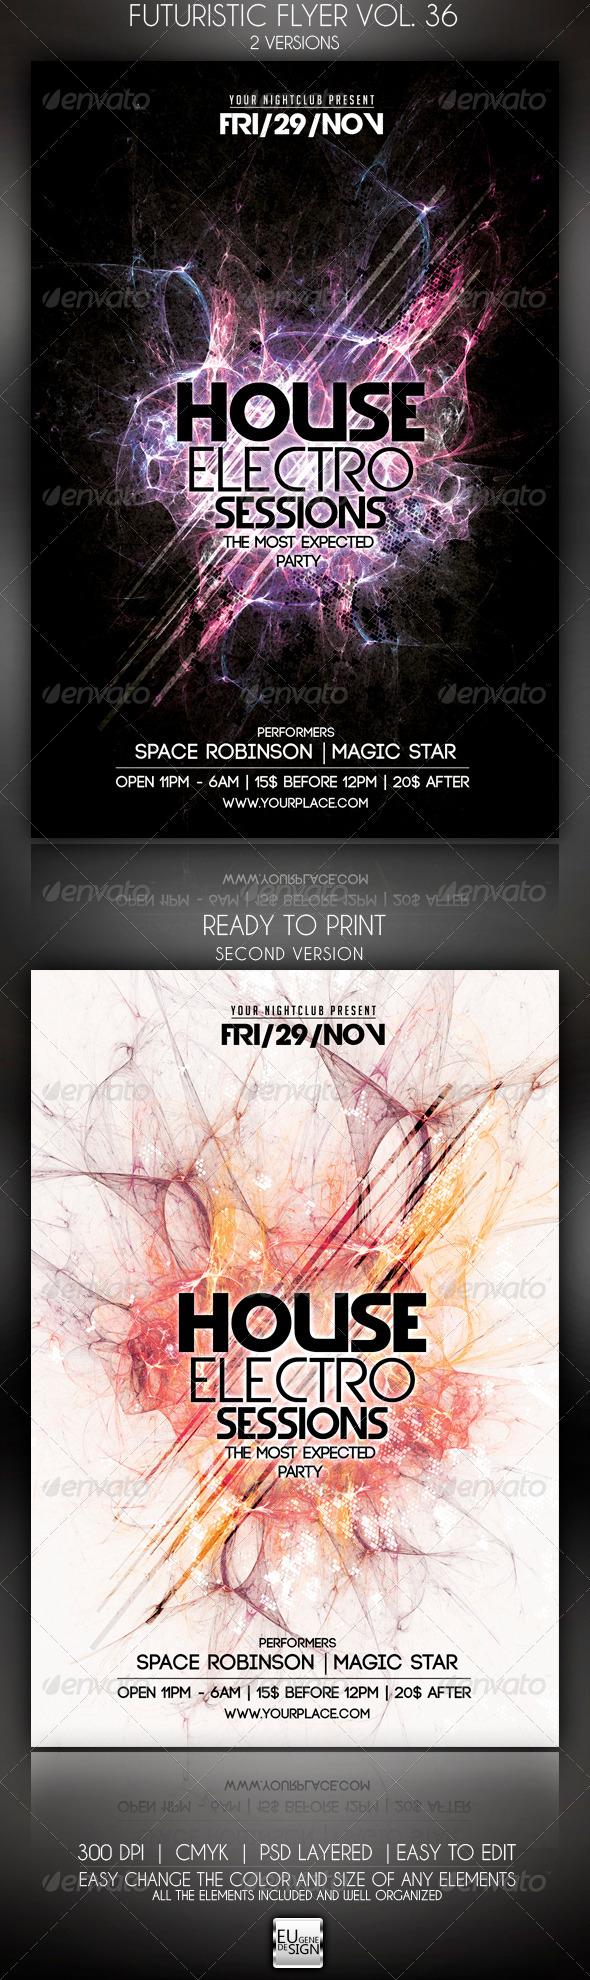 Futuristic Flyer Vol. 36 - Clubs & Parties Events